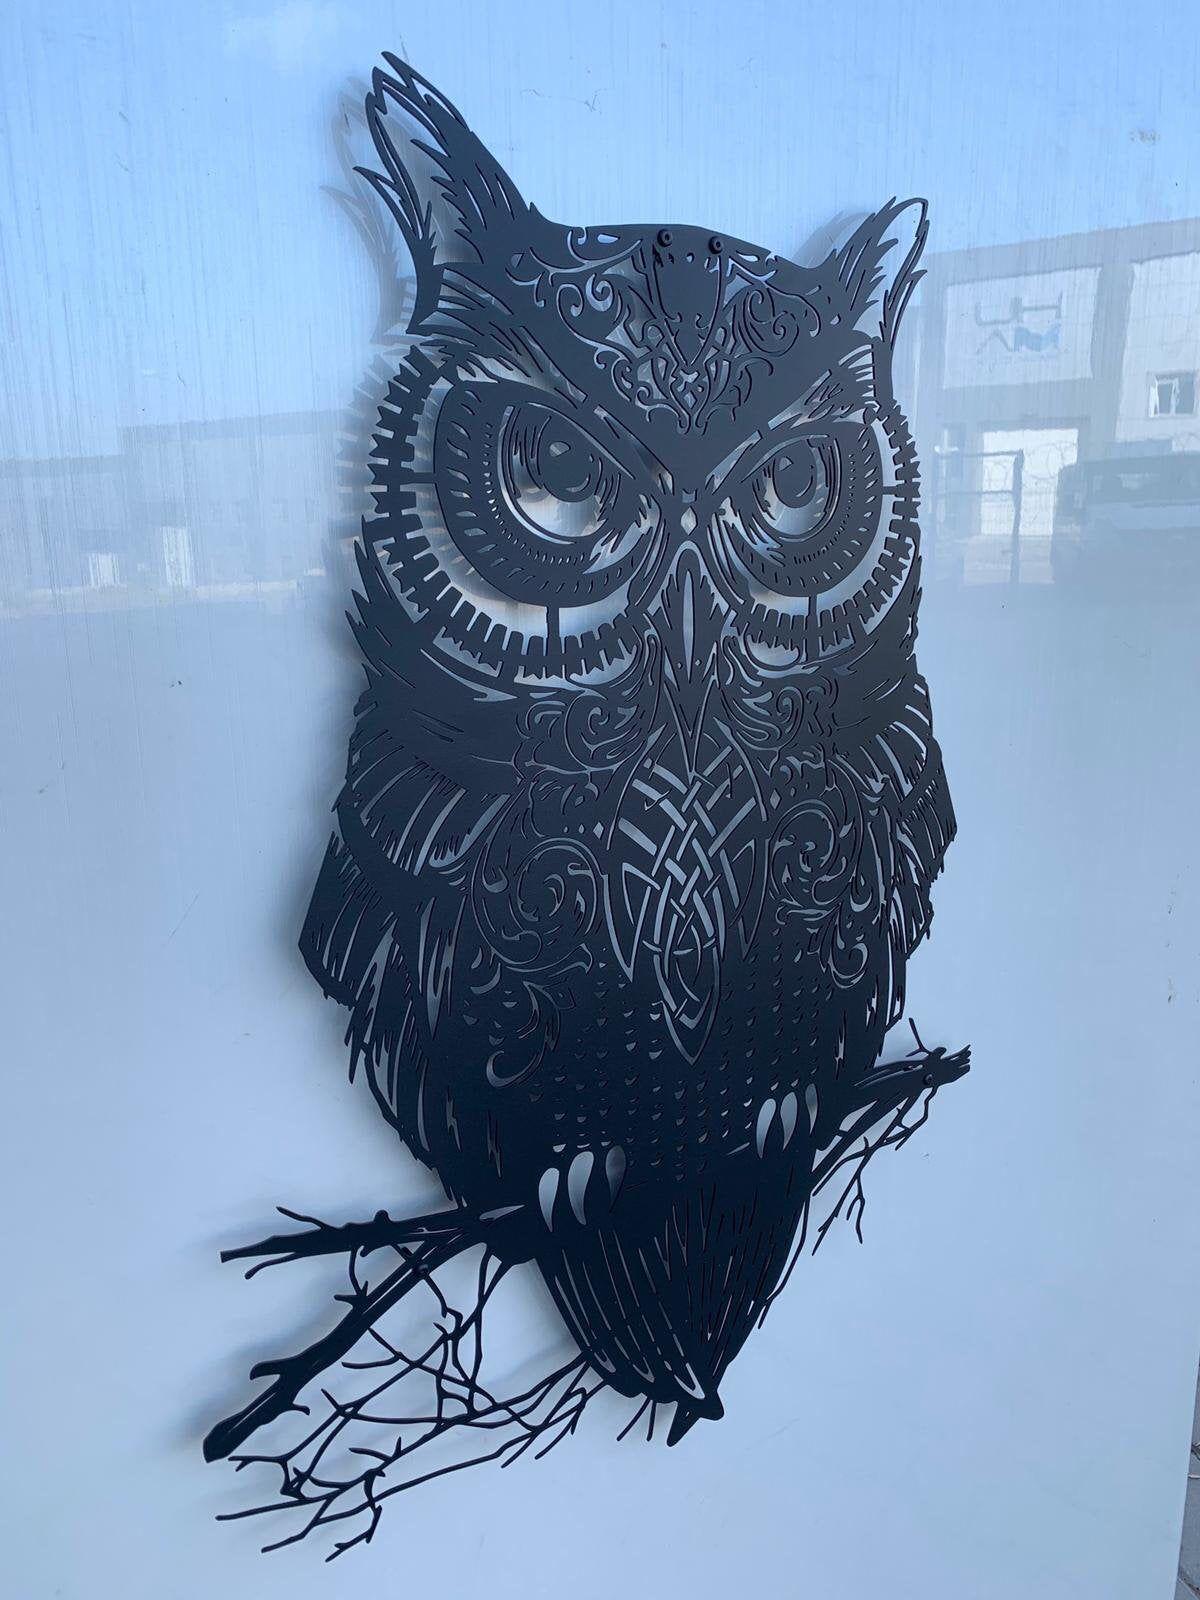 Owl Metal Wall Art Metal Wall Sculpture Metal Wall Decor Etsy Metal Wall Art Metal Wall Sculpture Large Metal Wall Art